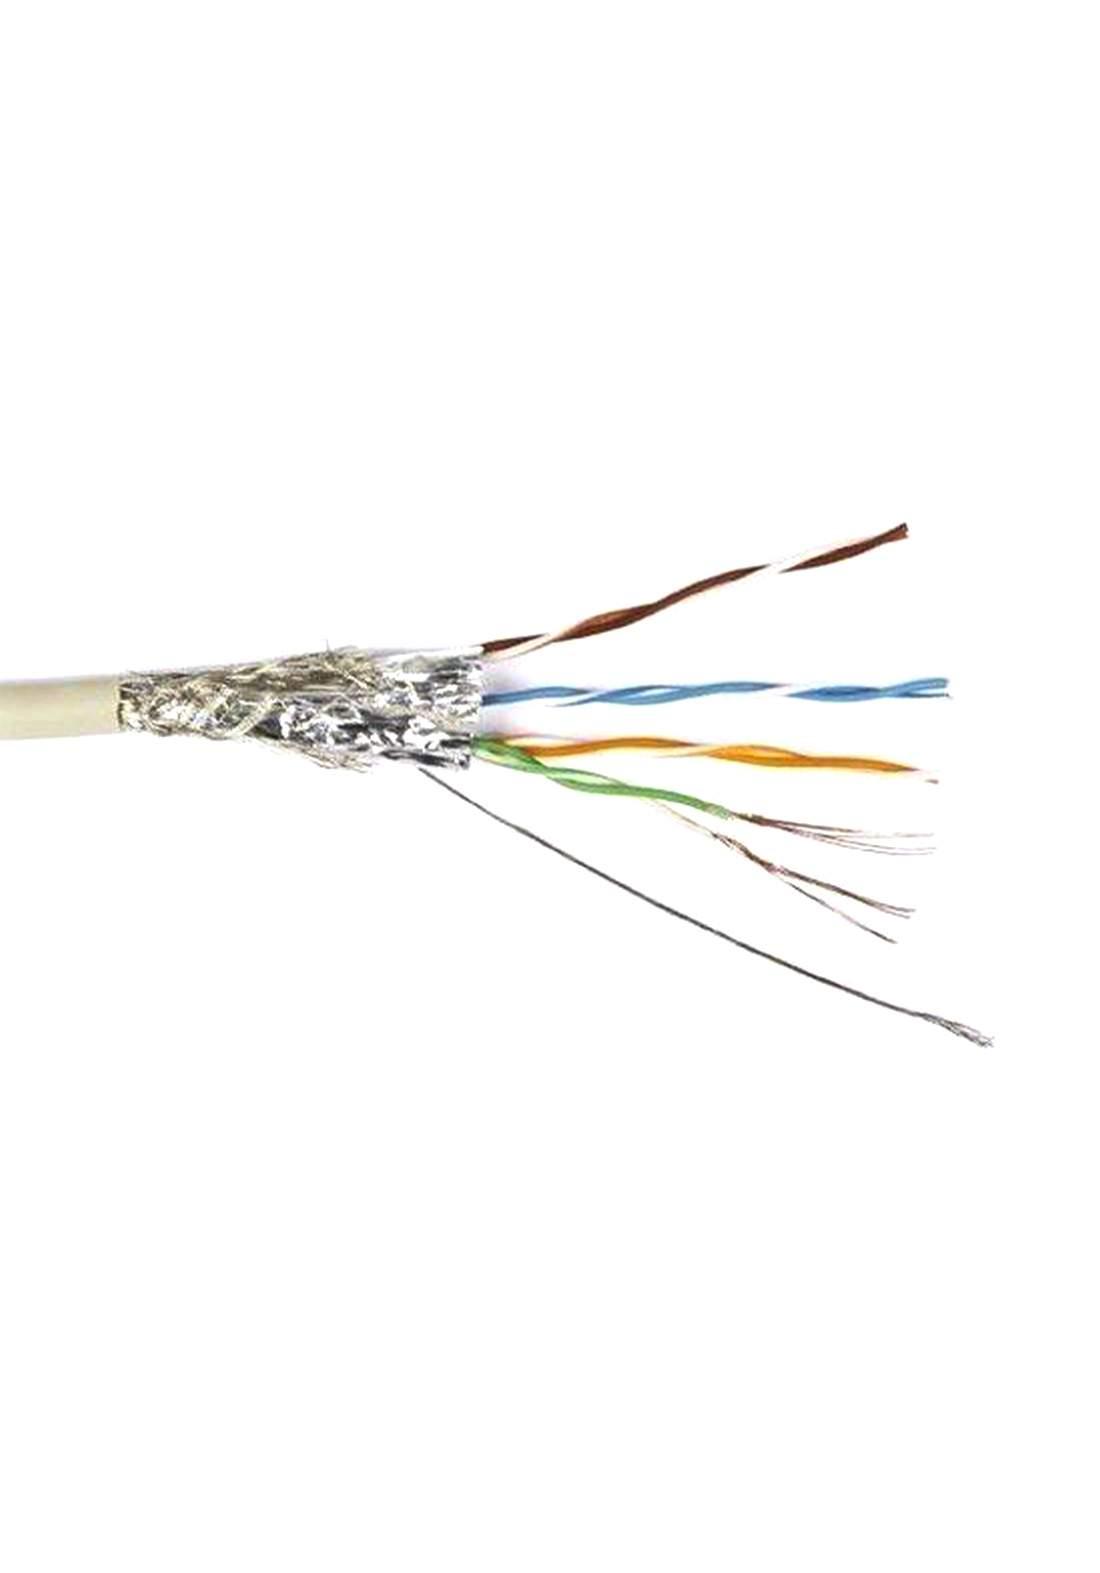 Aico Cat5 SFTP Cable 305m - White كابل